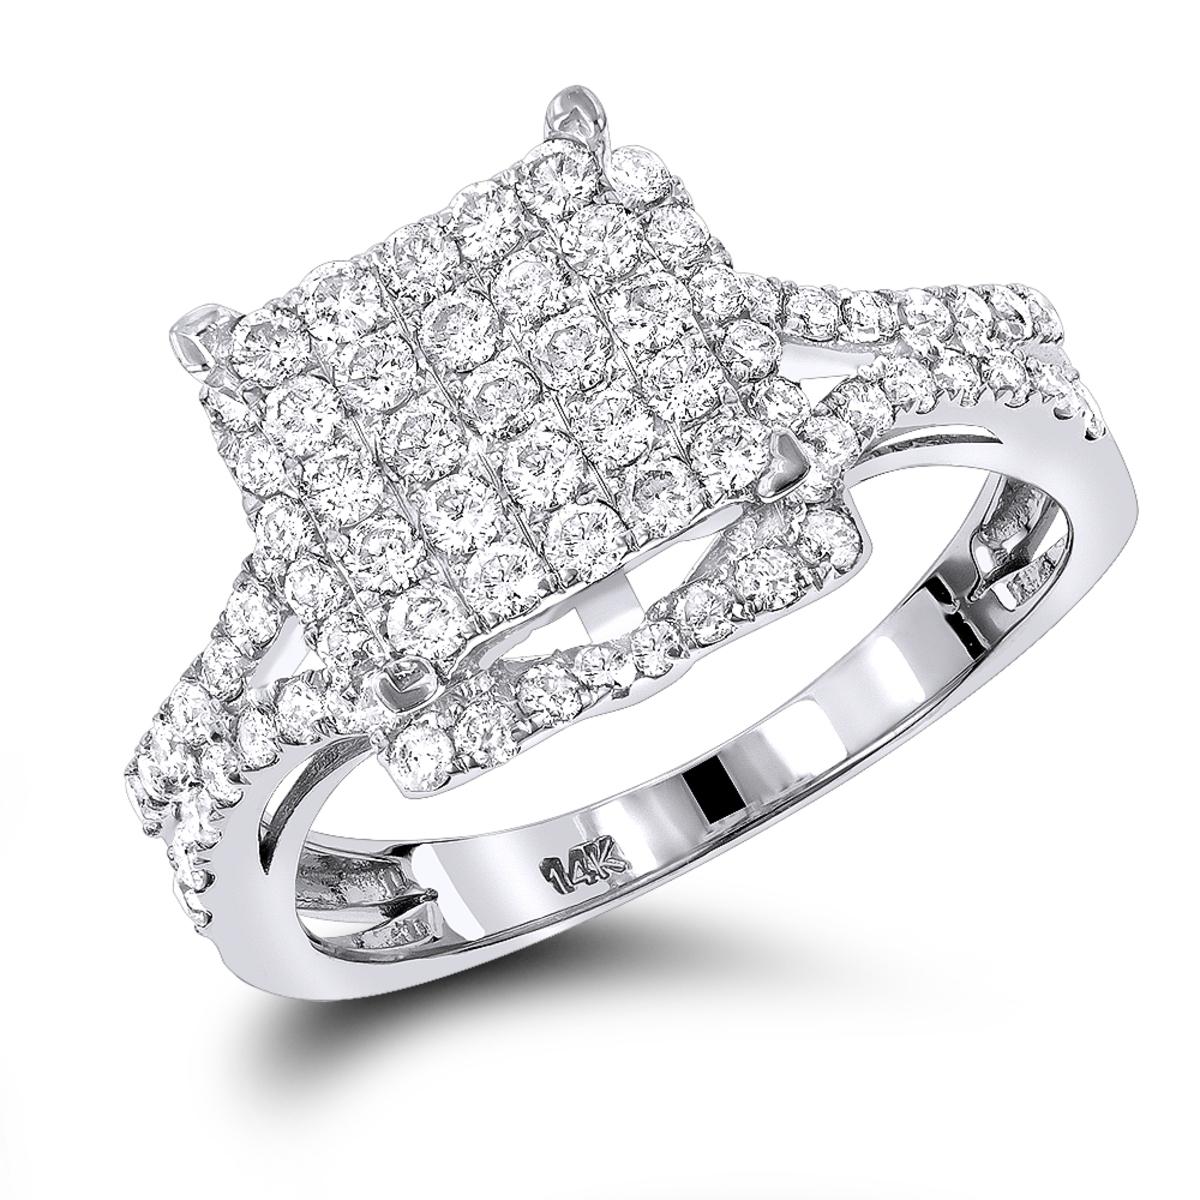 14K Pave Diamond Engagement Ring 1.25ct